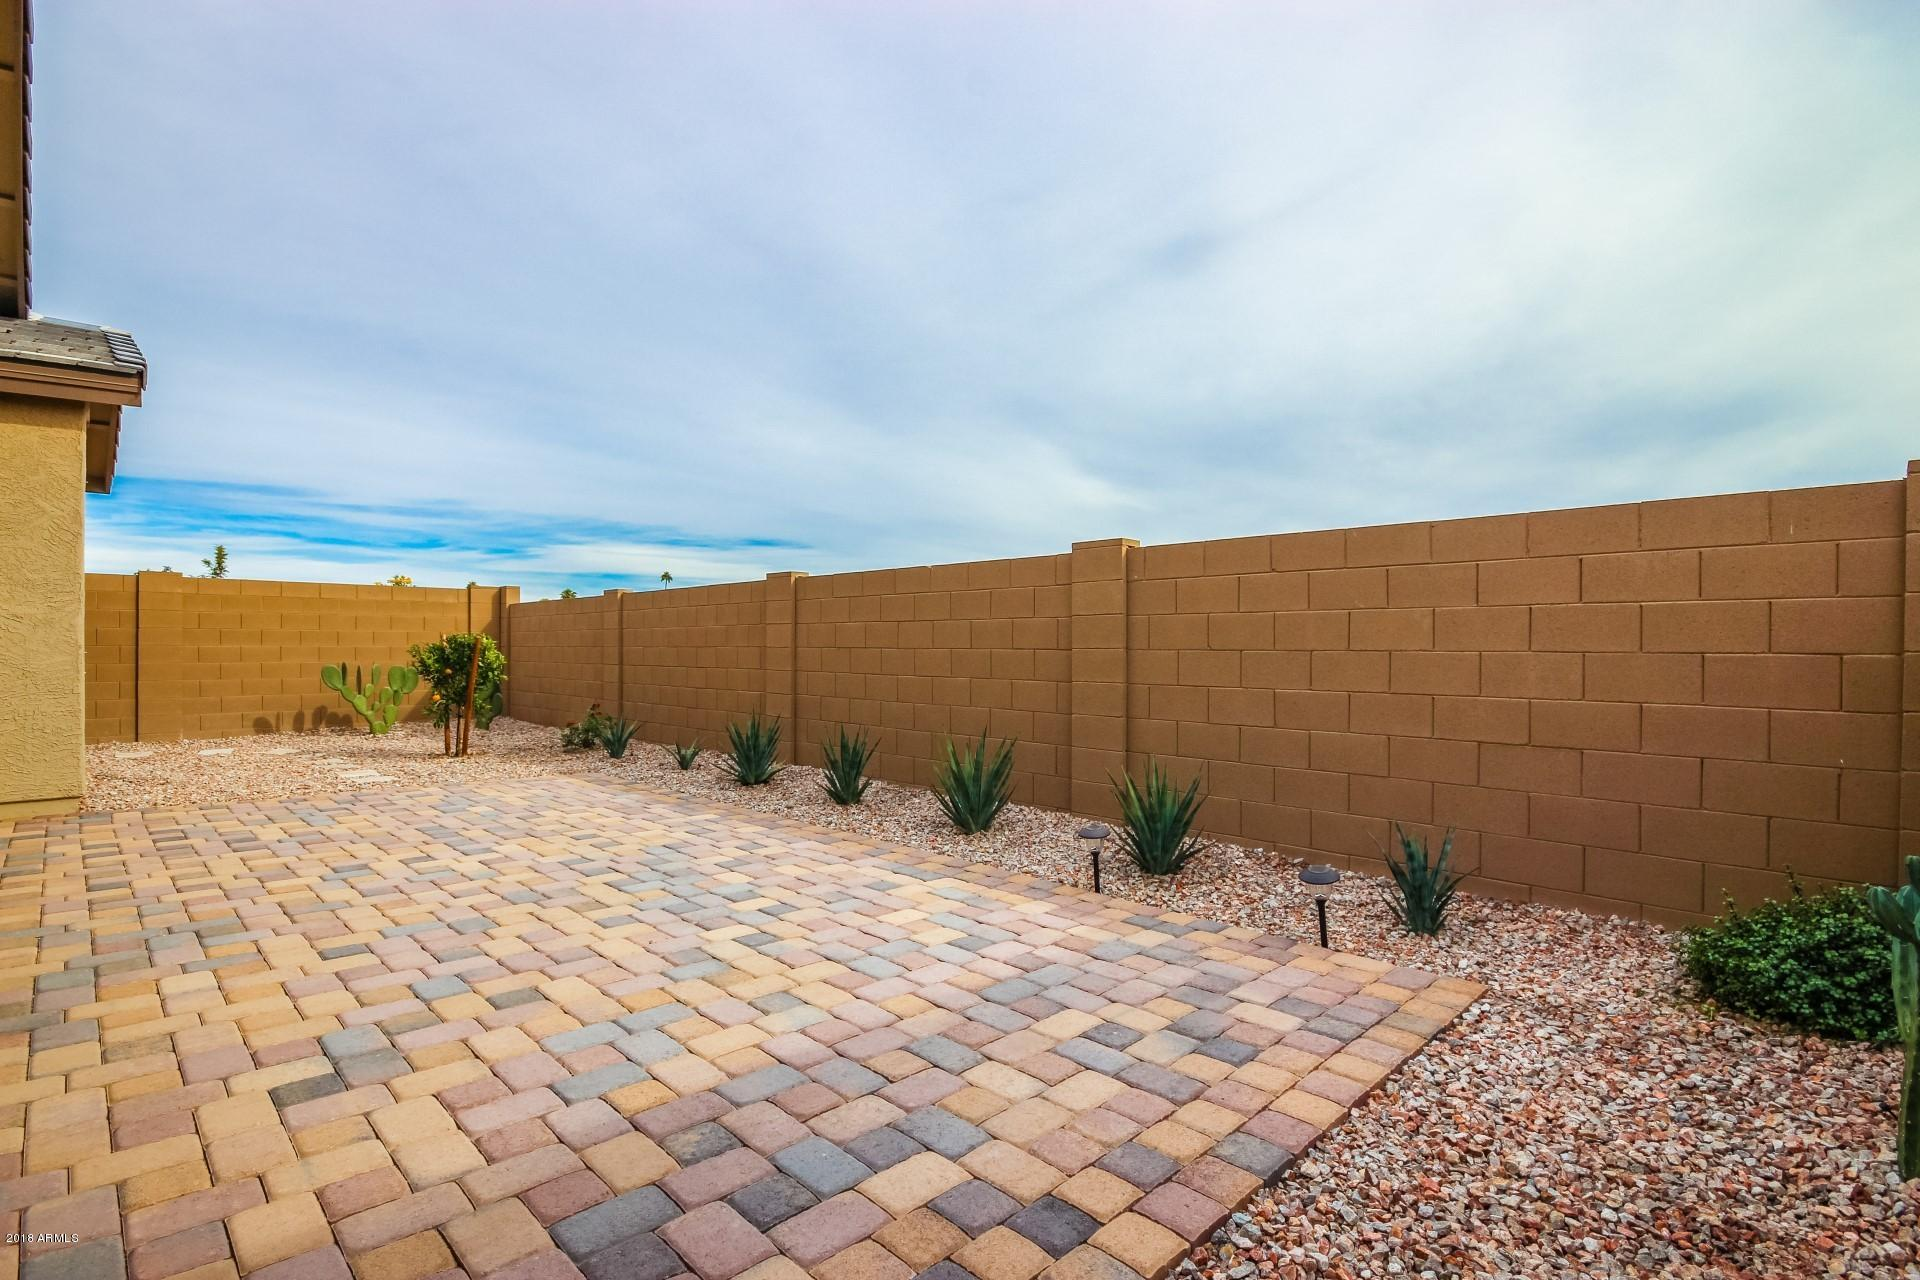 MLS 5843738 16009 N 109TH Avenue, Sun City, AZ 85351 Sun City AZ Two Bedroom